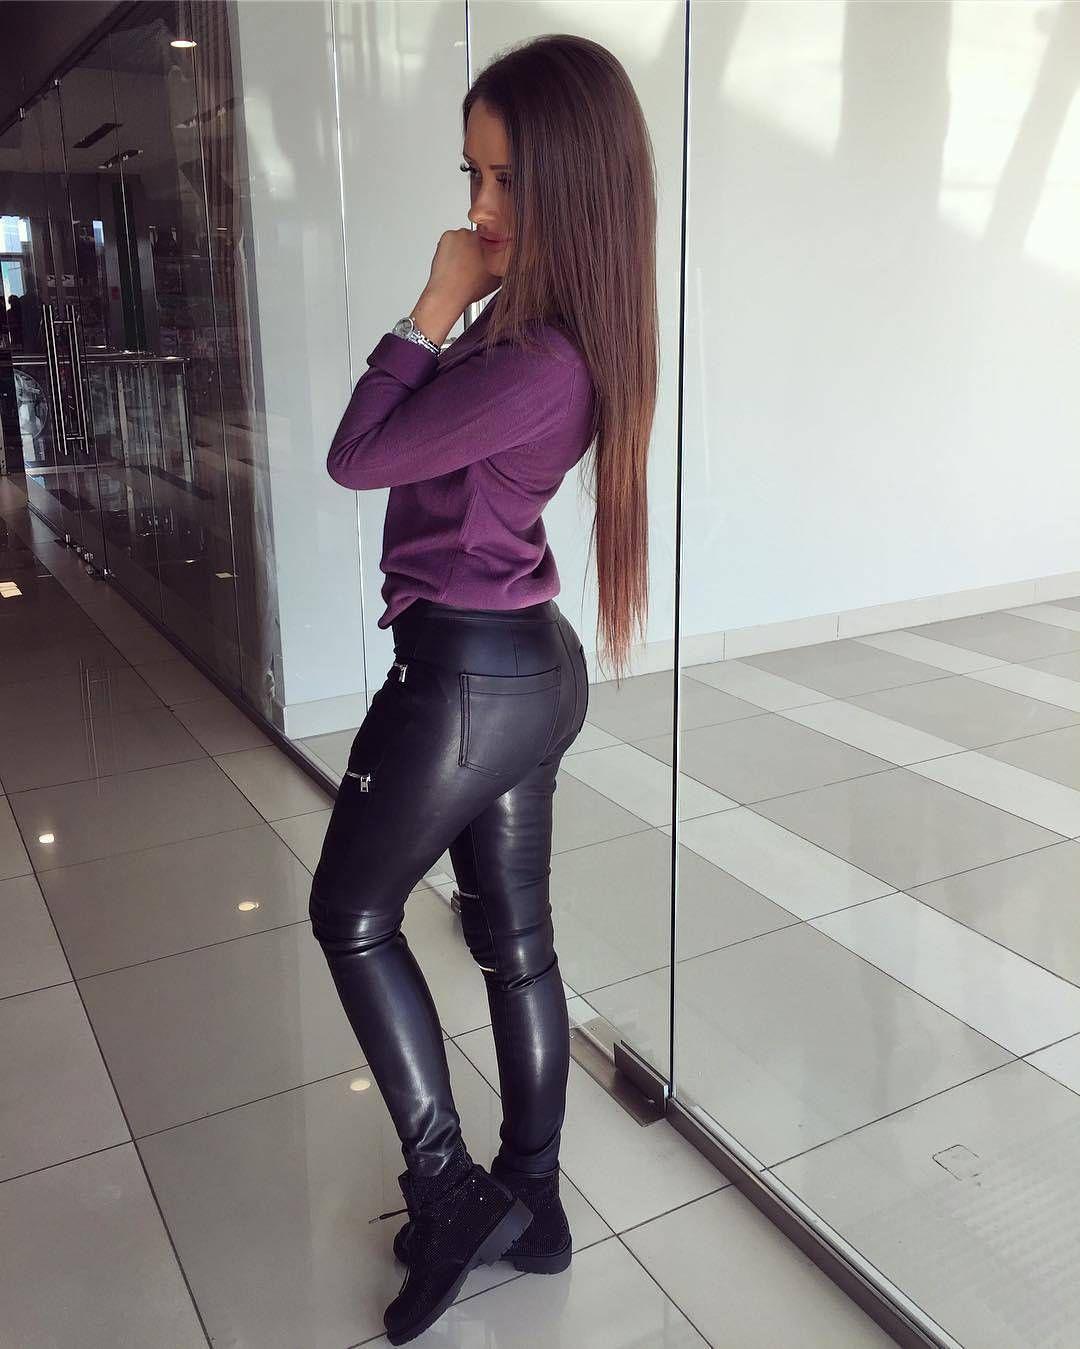 Leather leggings fashion (@leather_legs) • Instagram ...